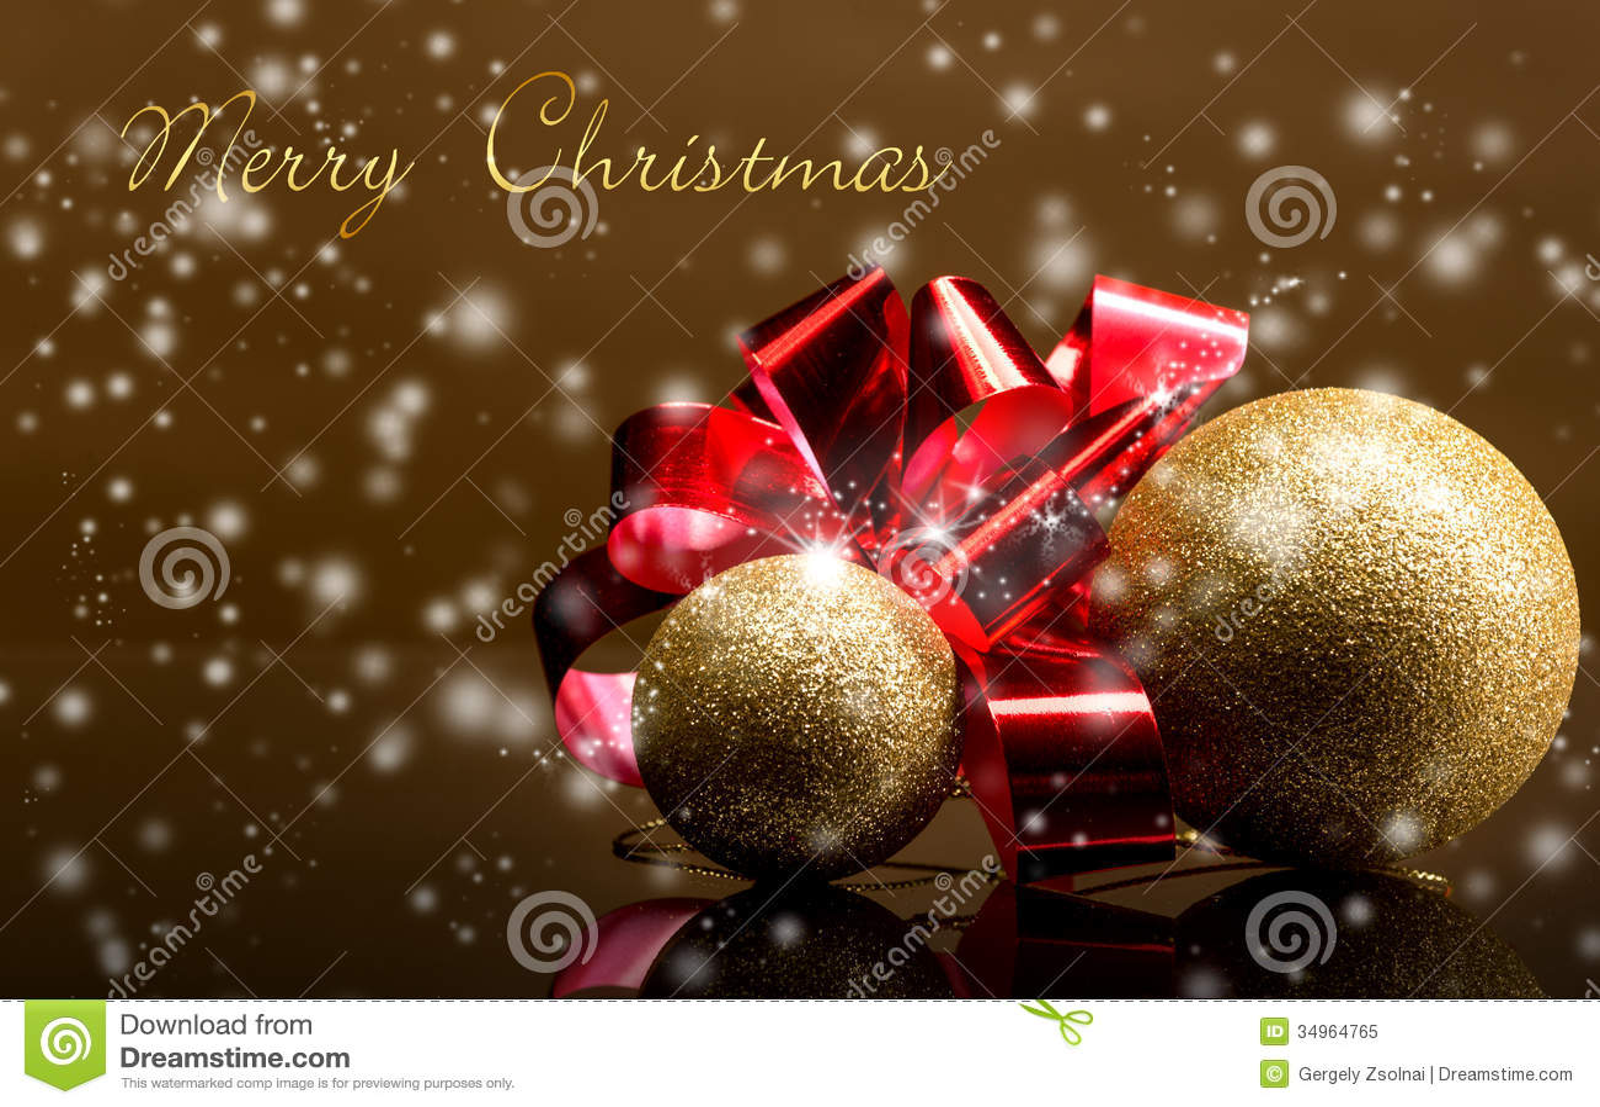 Christmas Cards Royalty Free Stock Photo Image 34964765